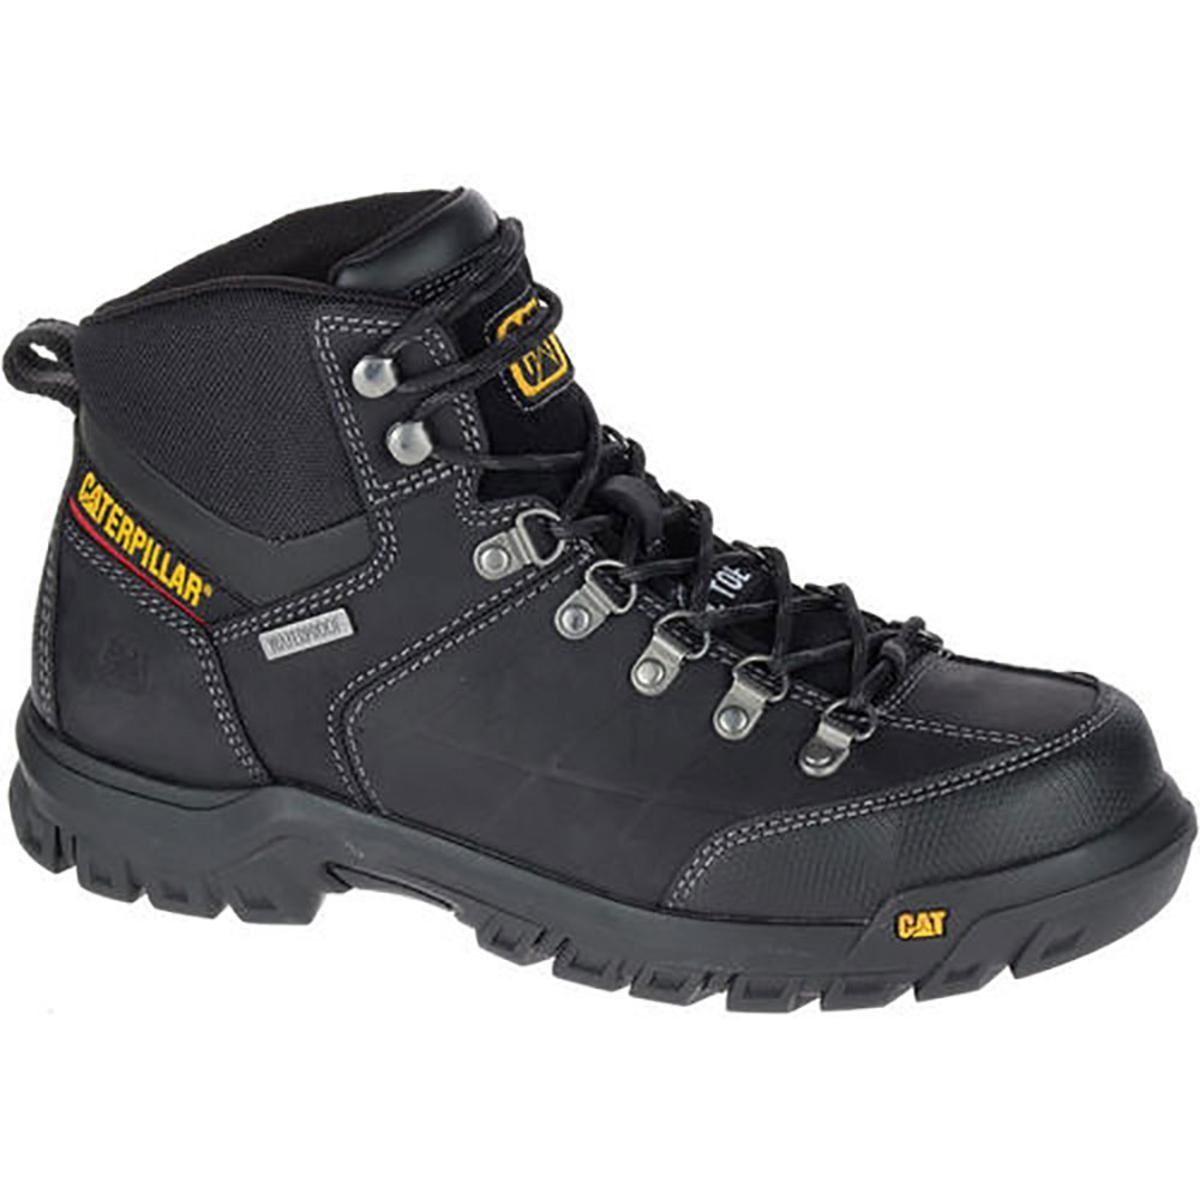 Men's Caterpillar Threshold Waterproof Boot, Size: 8 M, Black Leather